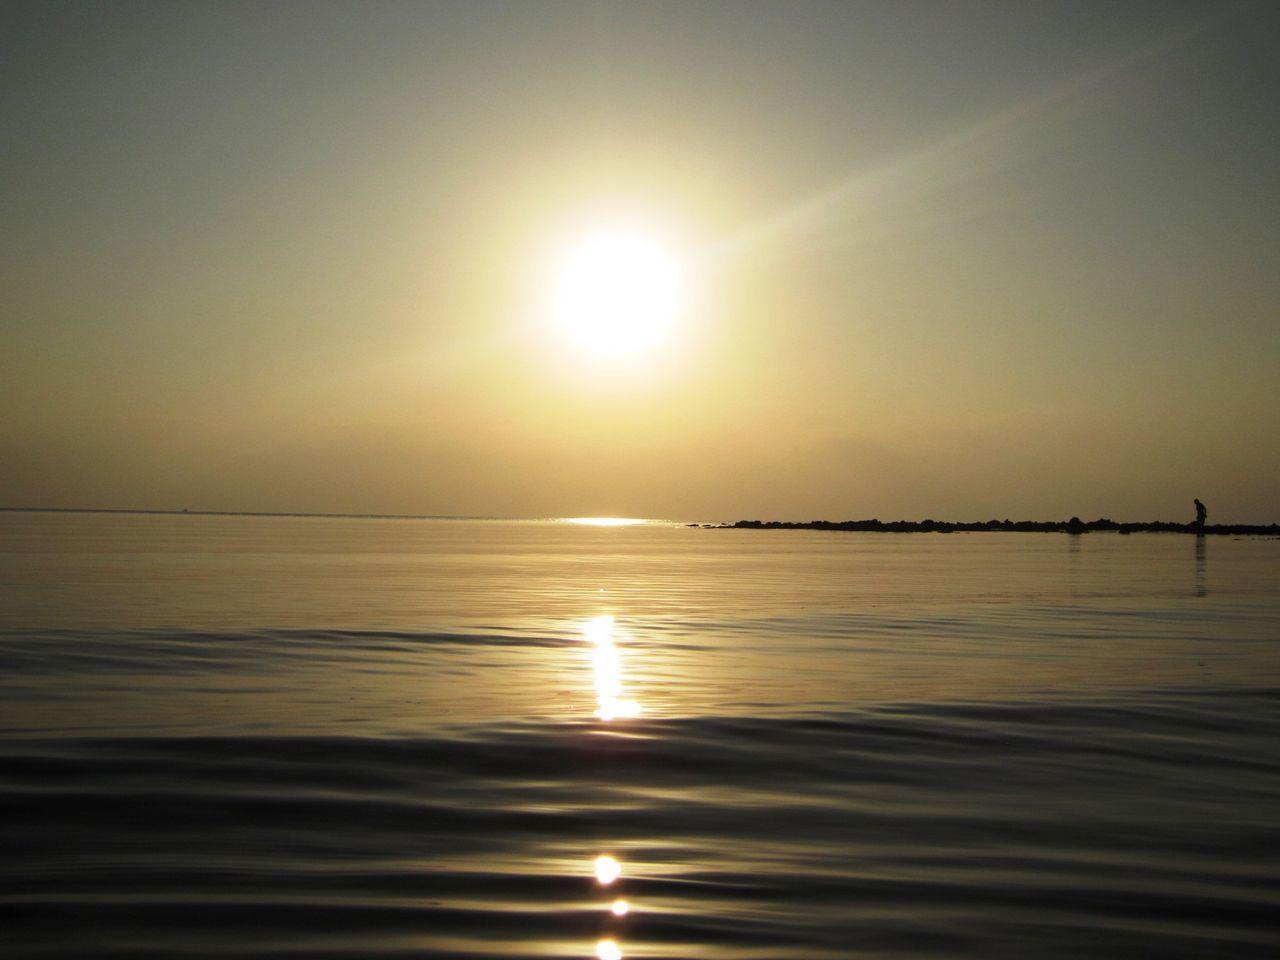 calm island sunset Beauty In Nature Calmness Horizon Over Water Nature Sea Serenity Sunset Tranquility EyeEmNewHere